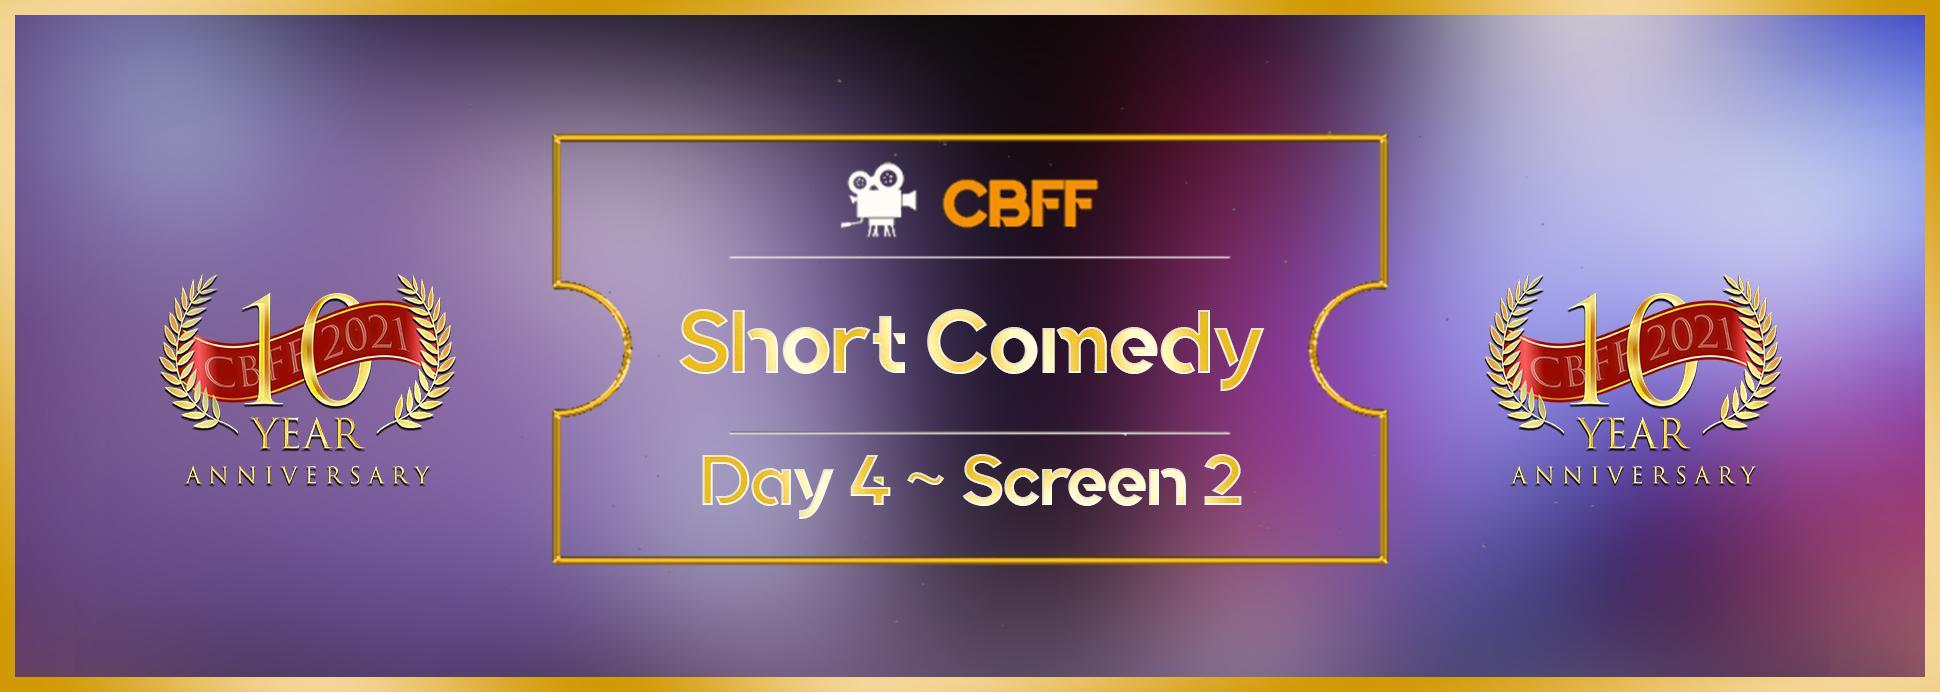 Day 4, Screen 2: Short Comedy